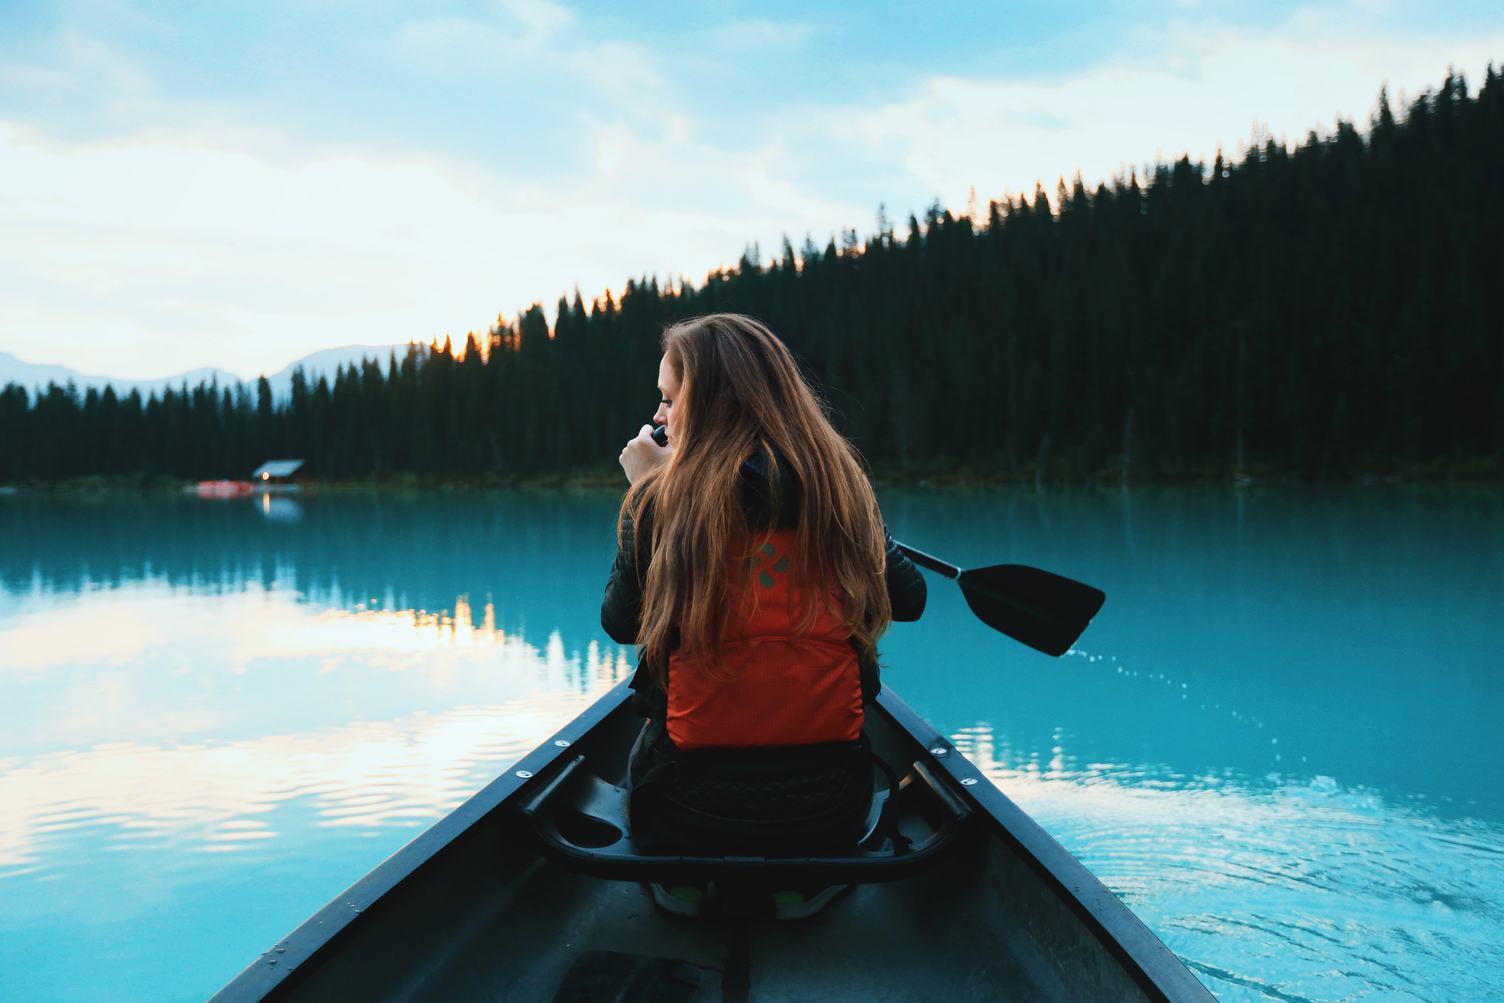 Woman in a Canoe, Lake Louise, Canada